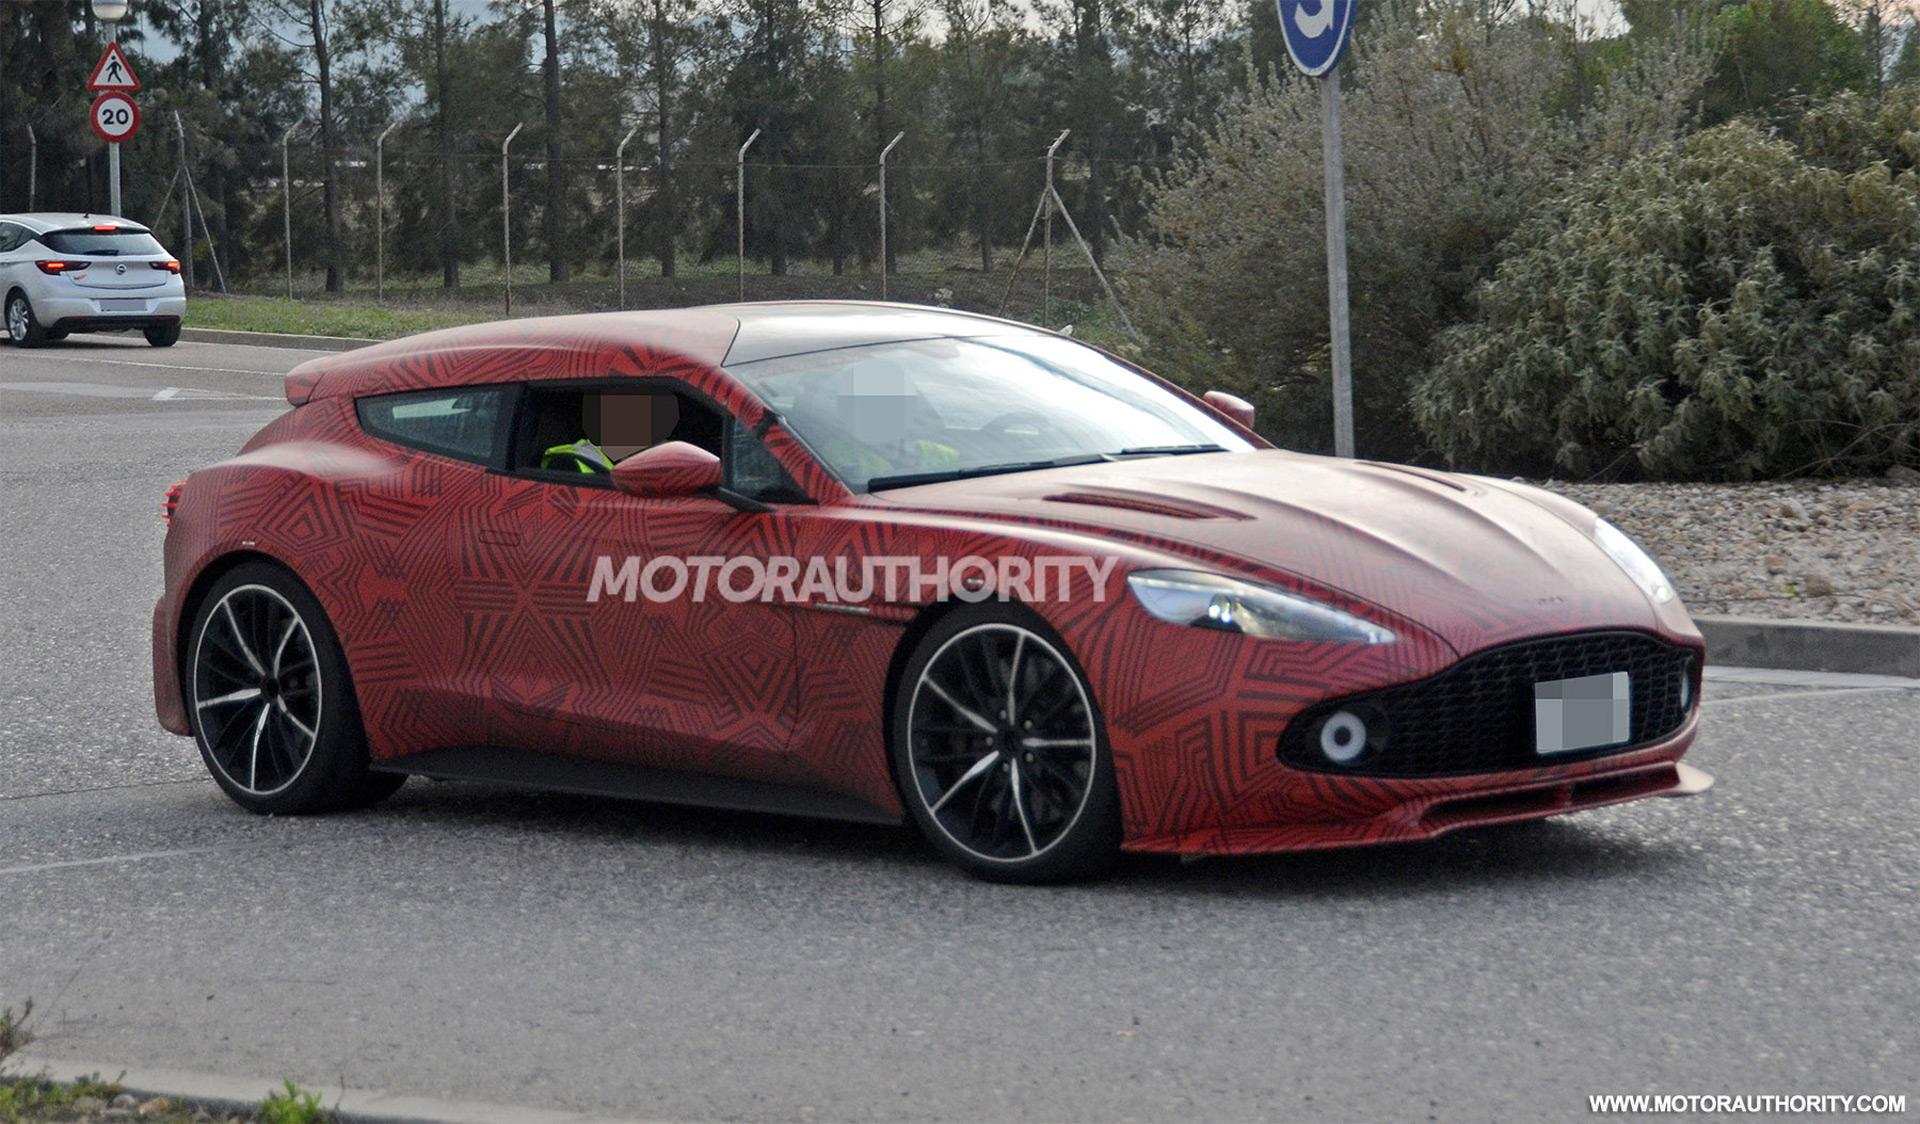 2012 - [Aston Martin] Vanquish [310] - Page 11 Aston-martin-vanquish-zagato-shooting-brake-spy-shots--image-via-s-baldauf-sb-medien_100684626_h